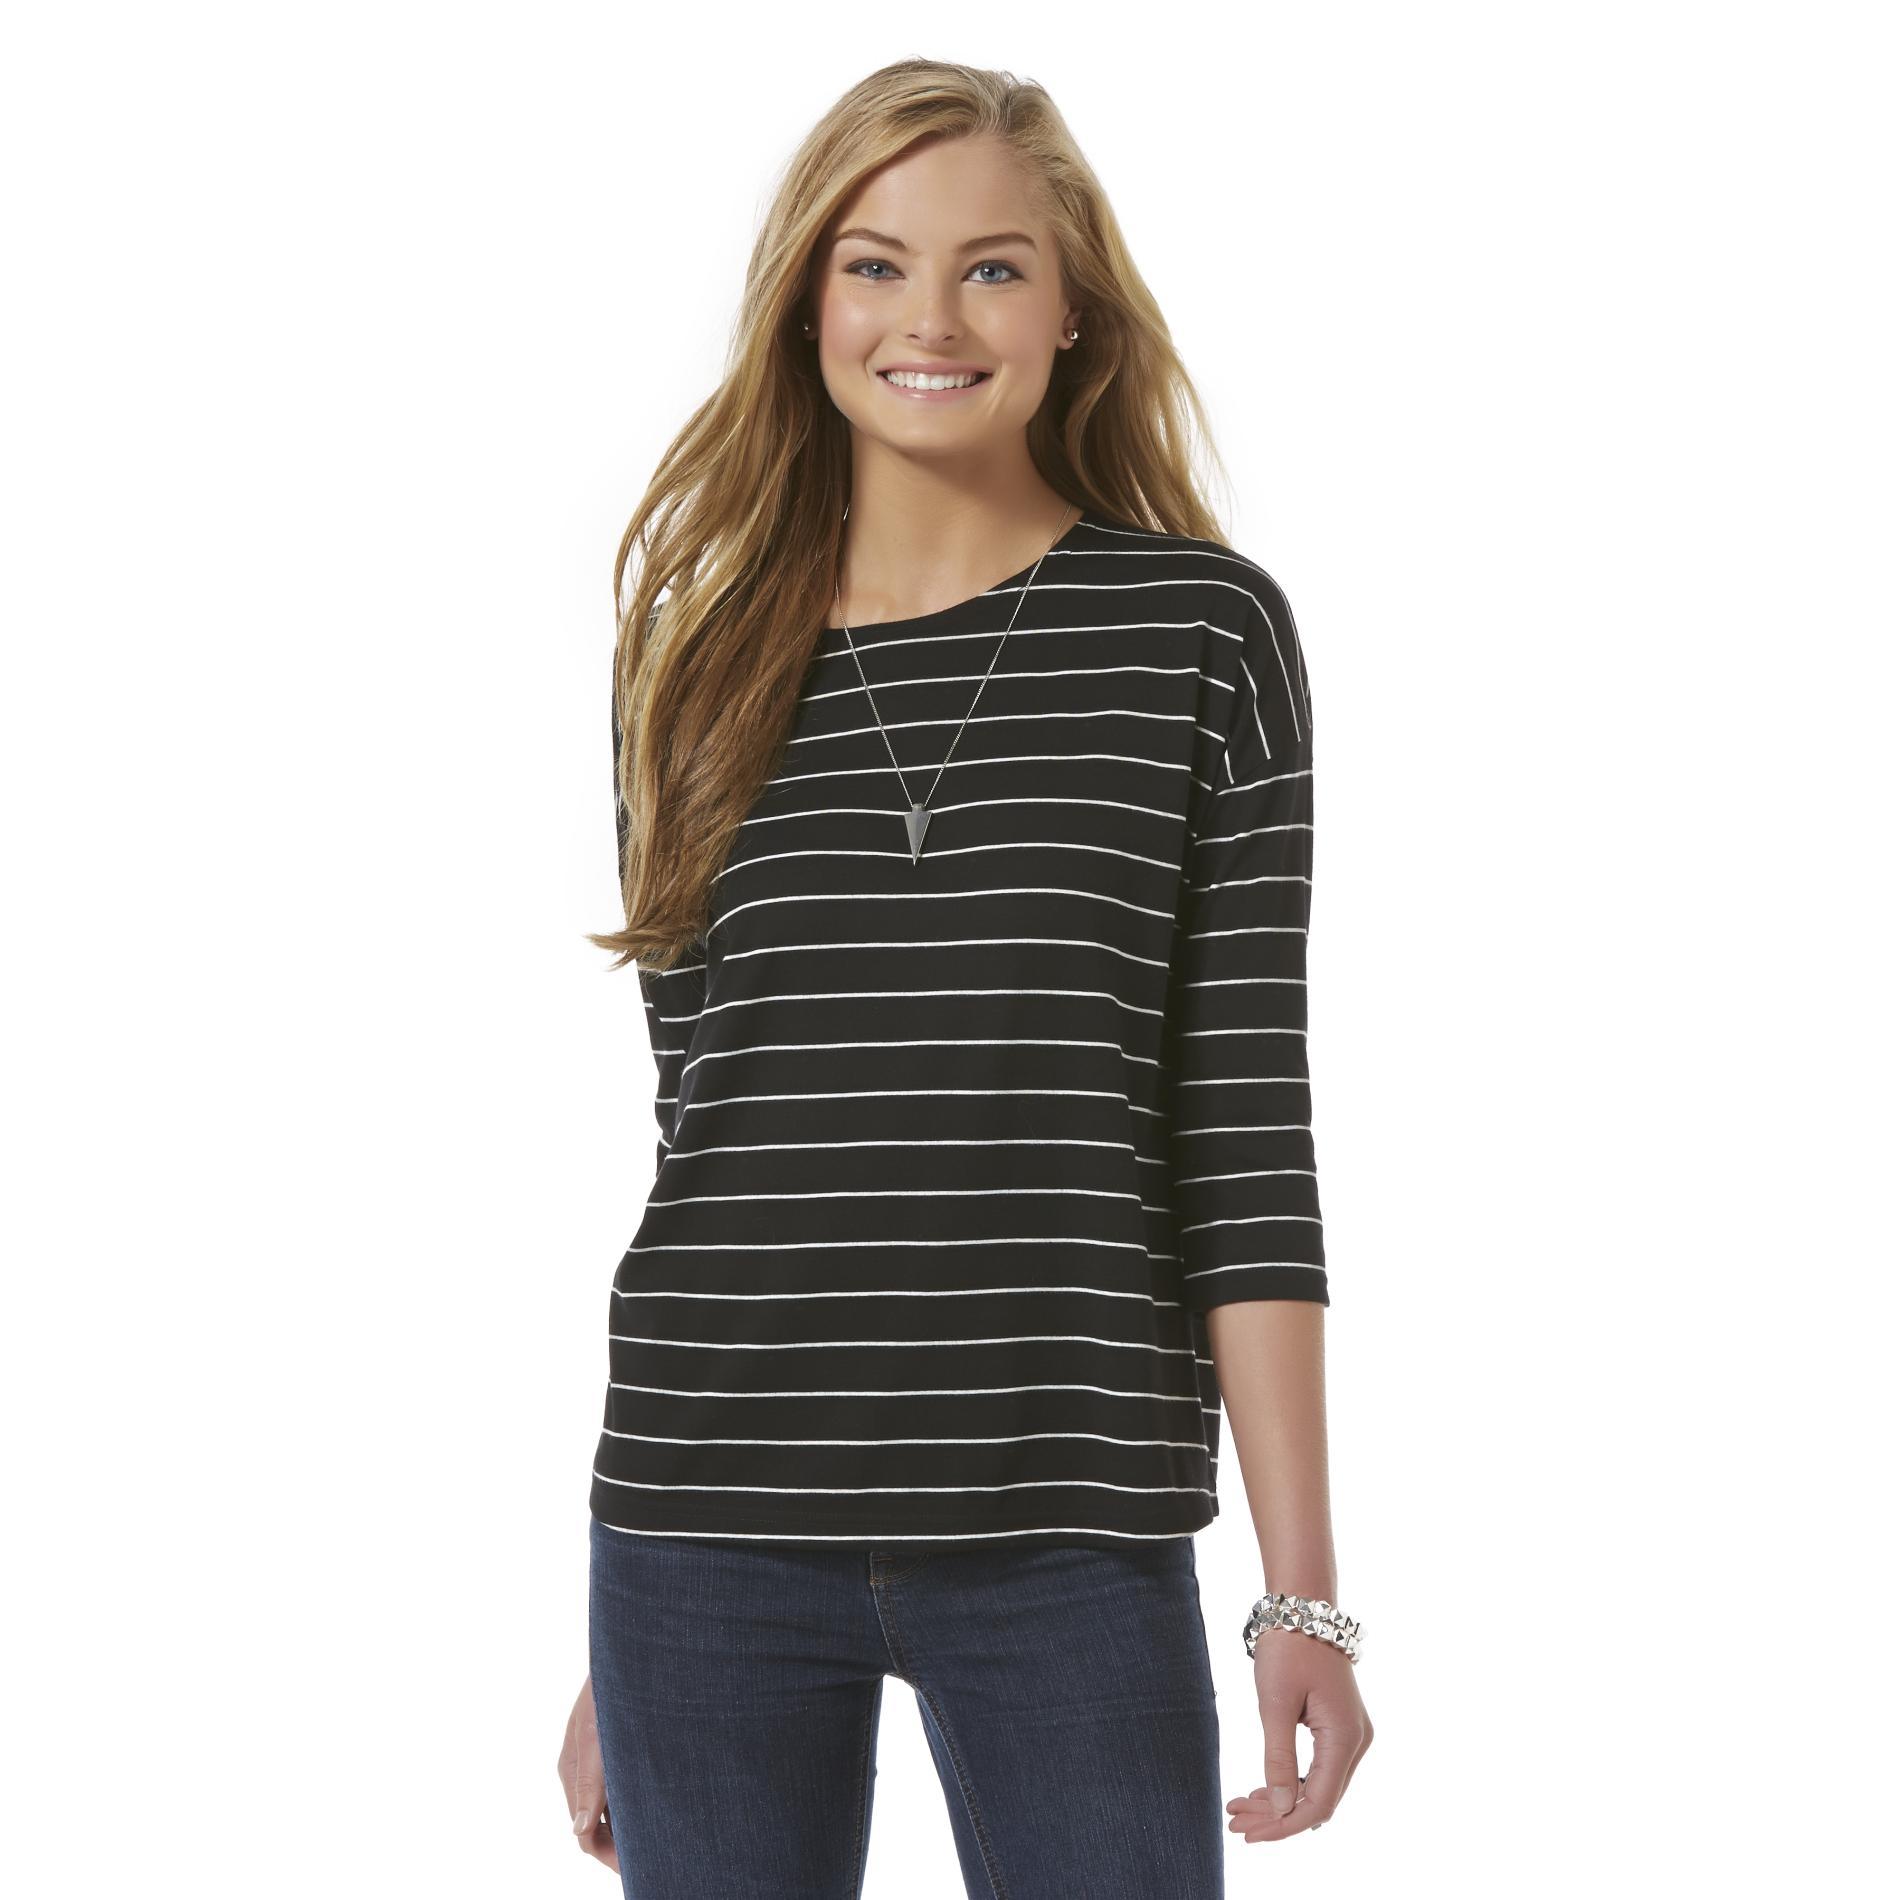 Bongo Junior' Long-sleeve T-shirt - Striped Clothing Juniors Tops